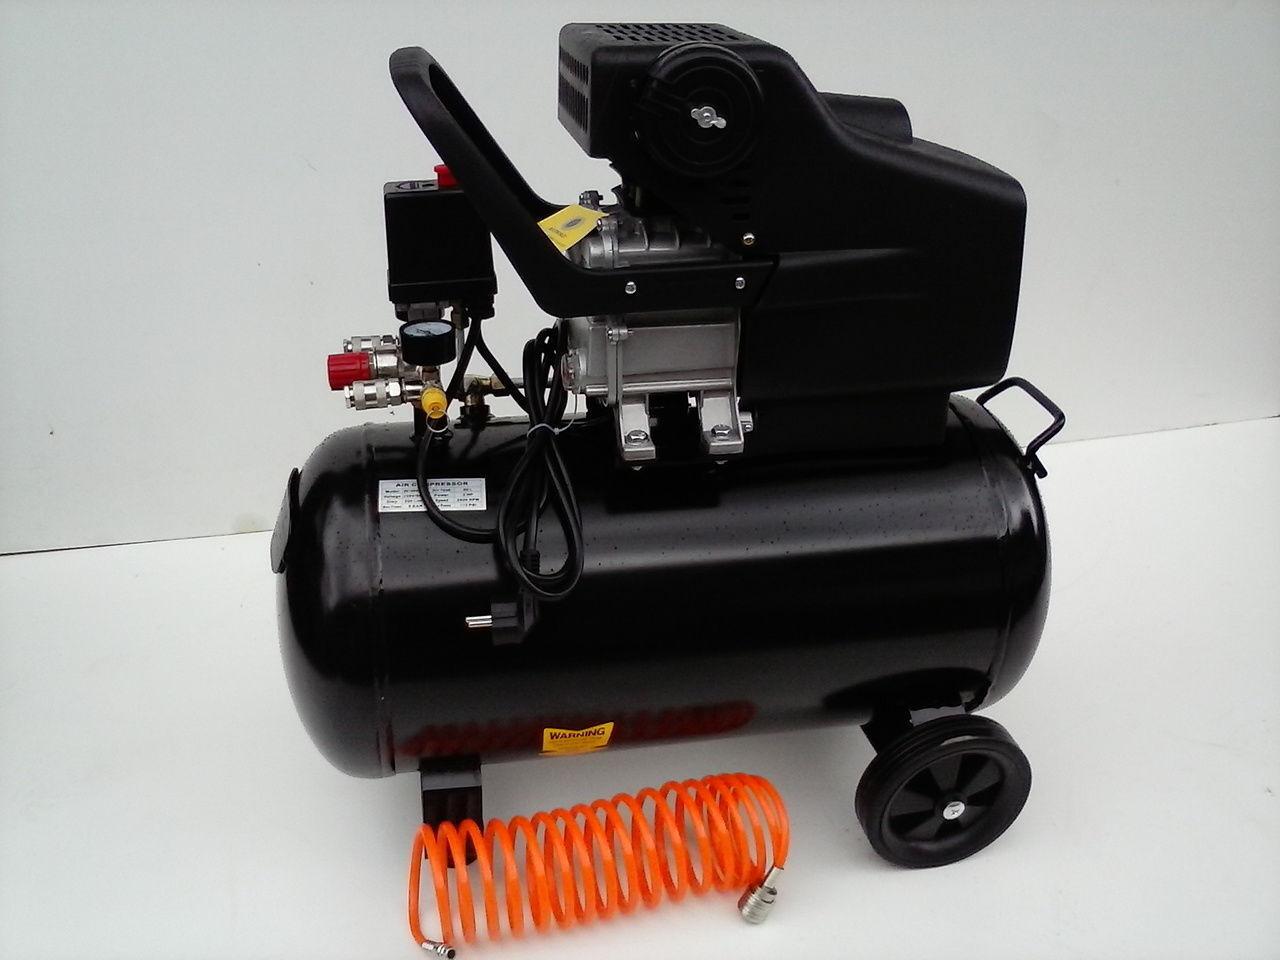 Kompressor Druckluft Druckluftkompressor Verdichter 2 PS 1500W/ 24 oder 50 Liter